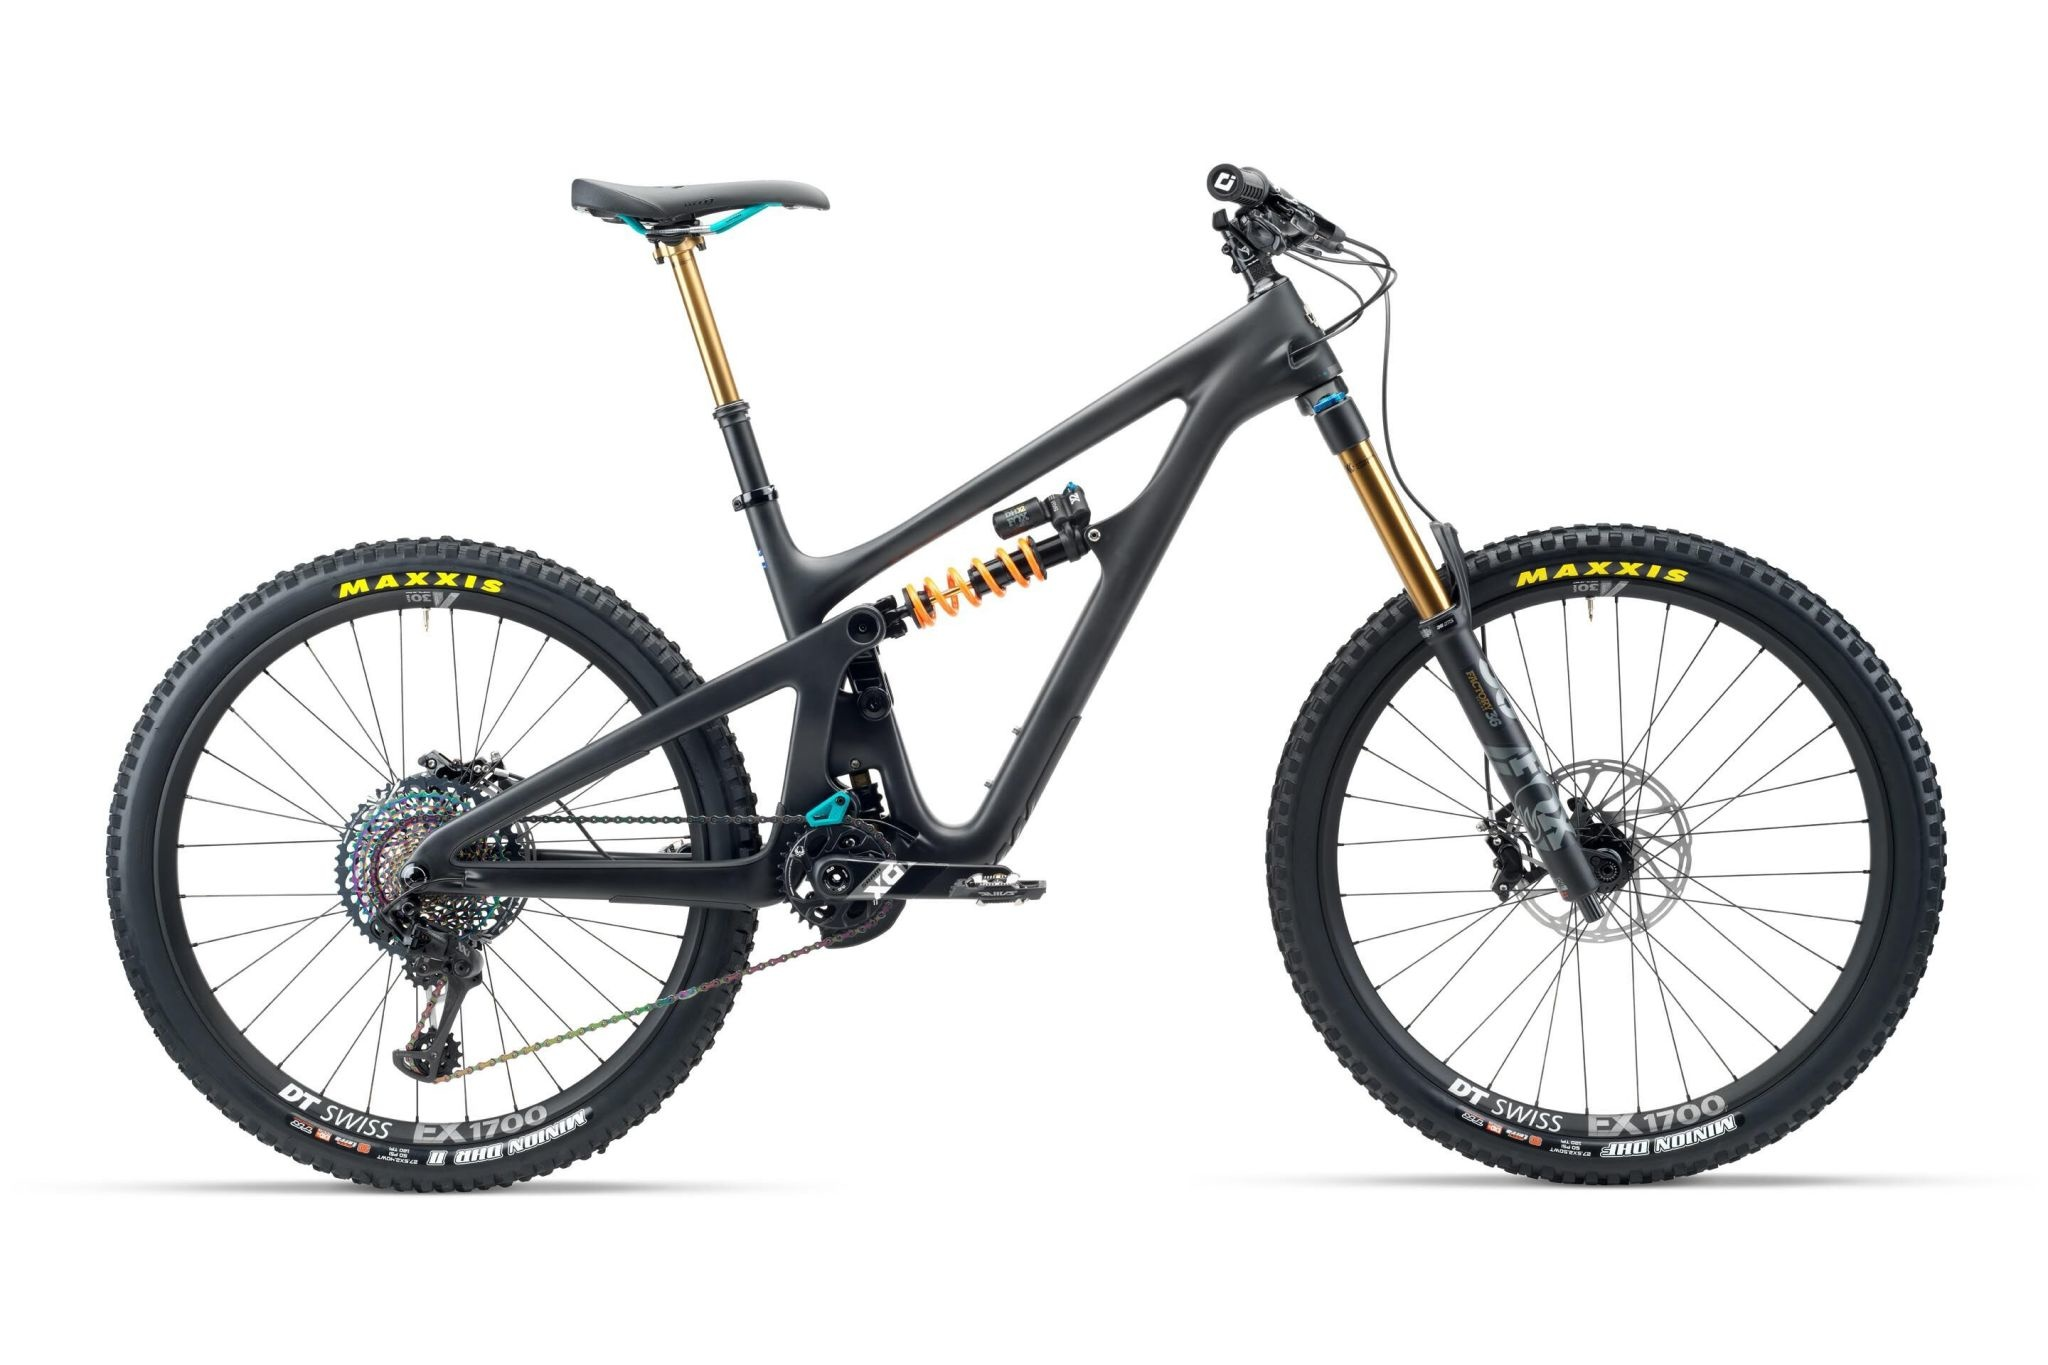 Yeti Cycles 20 Yeti SB165 T-series w/ T2 kit